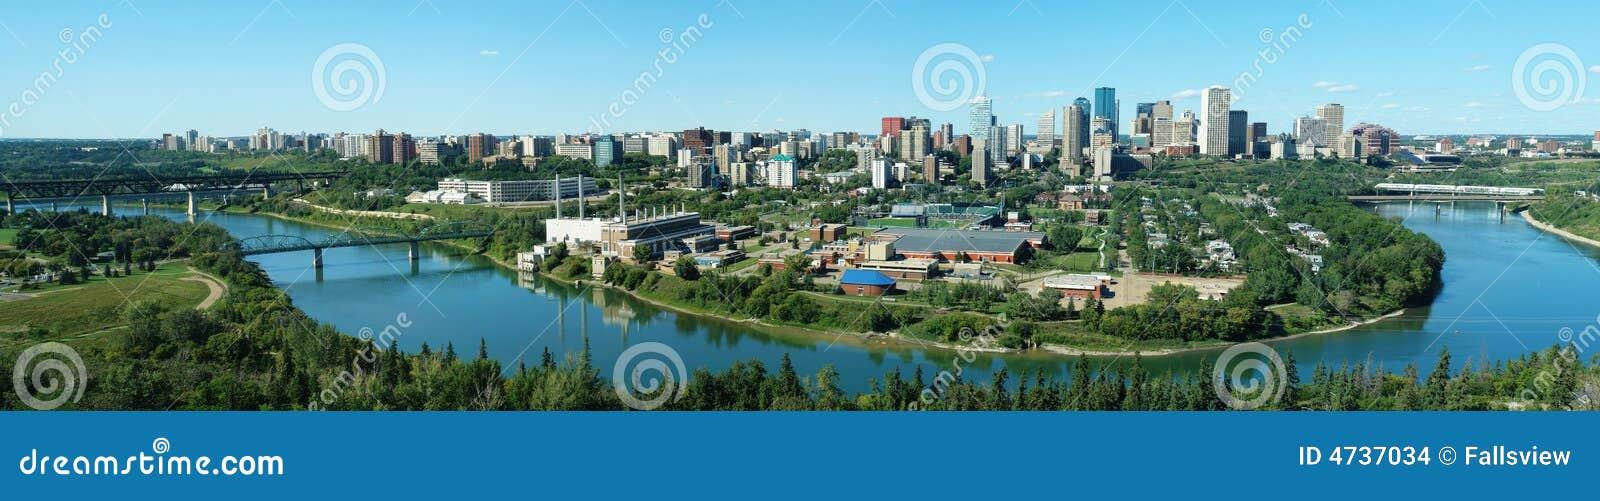 Panorama di Edmonton del centro